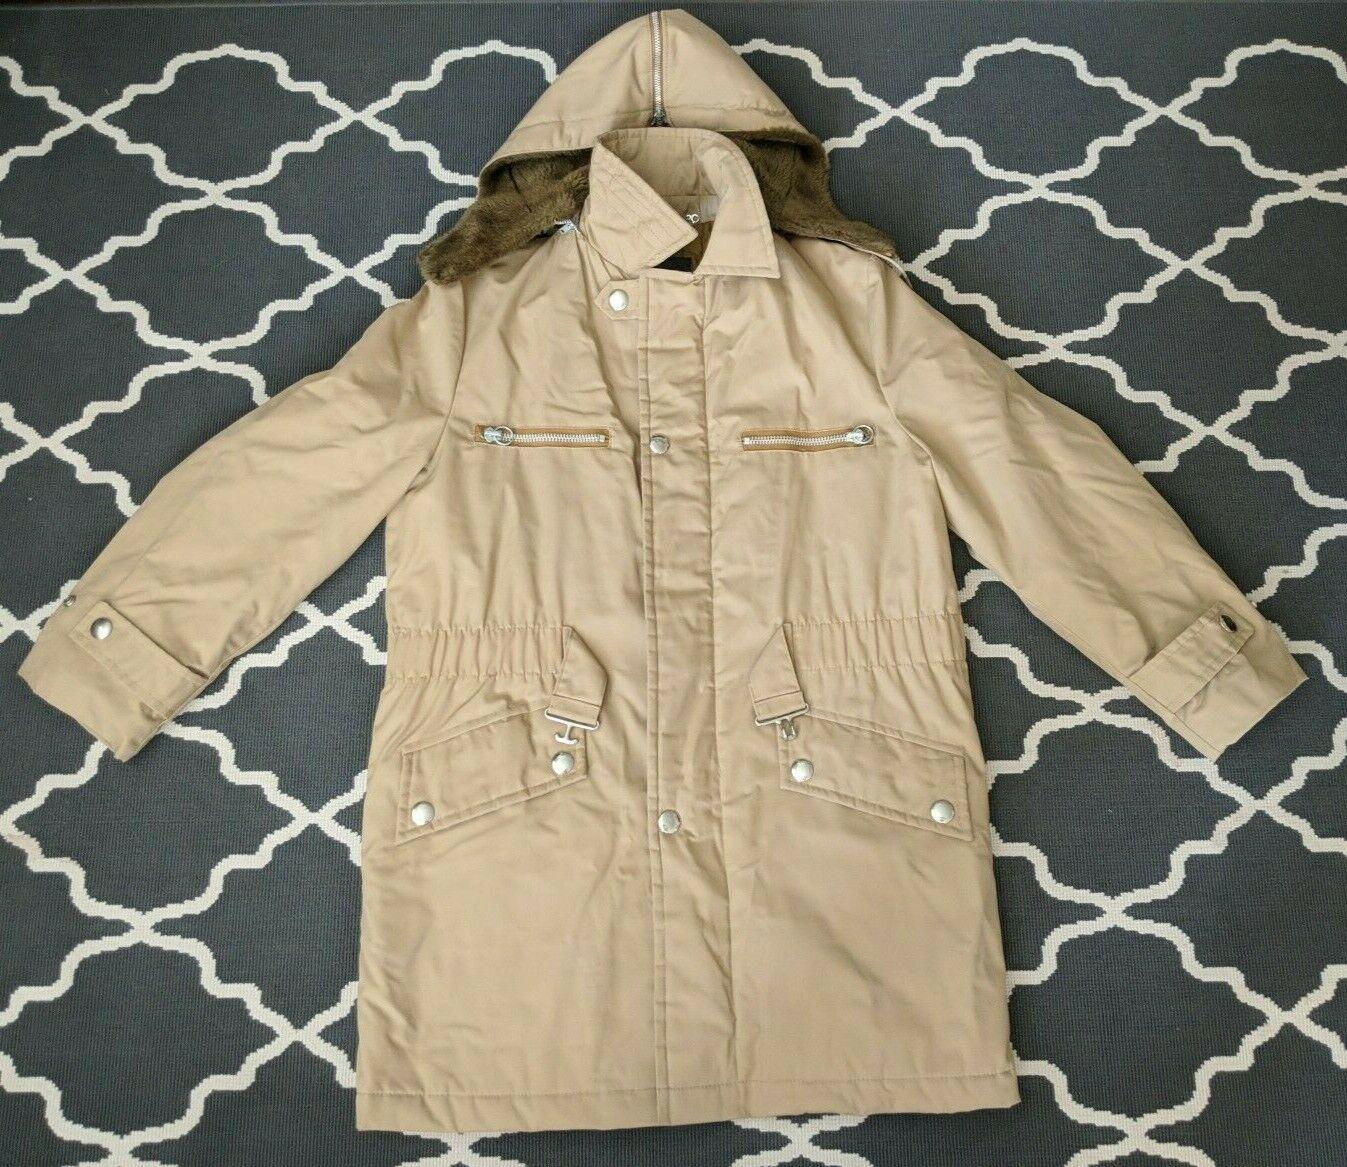 VTG Men's GRODINS California Trench Coat Jacket w/faux fur hood Sz L, 42